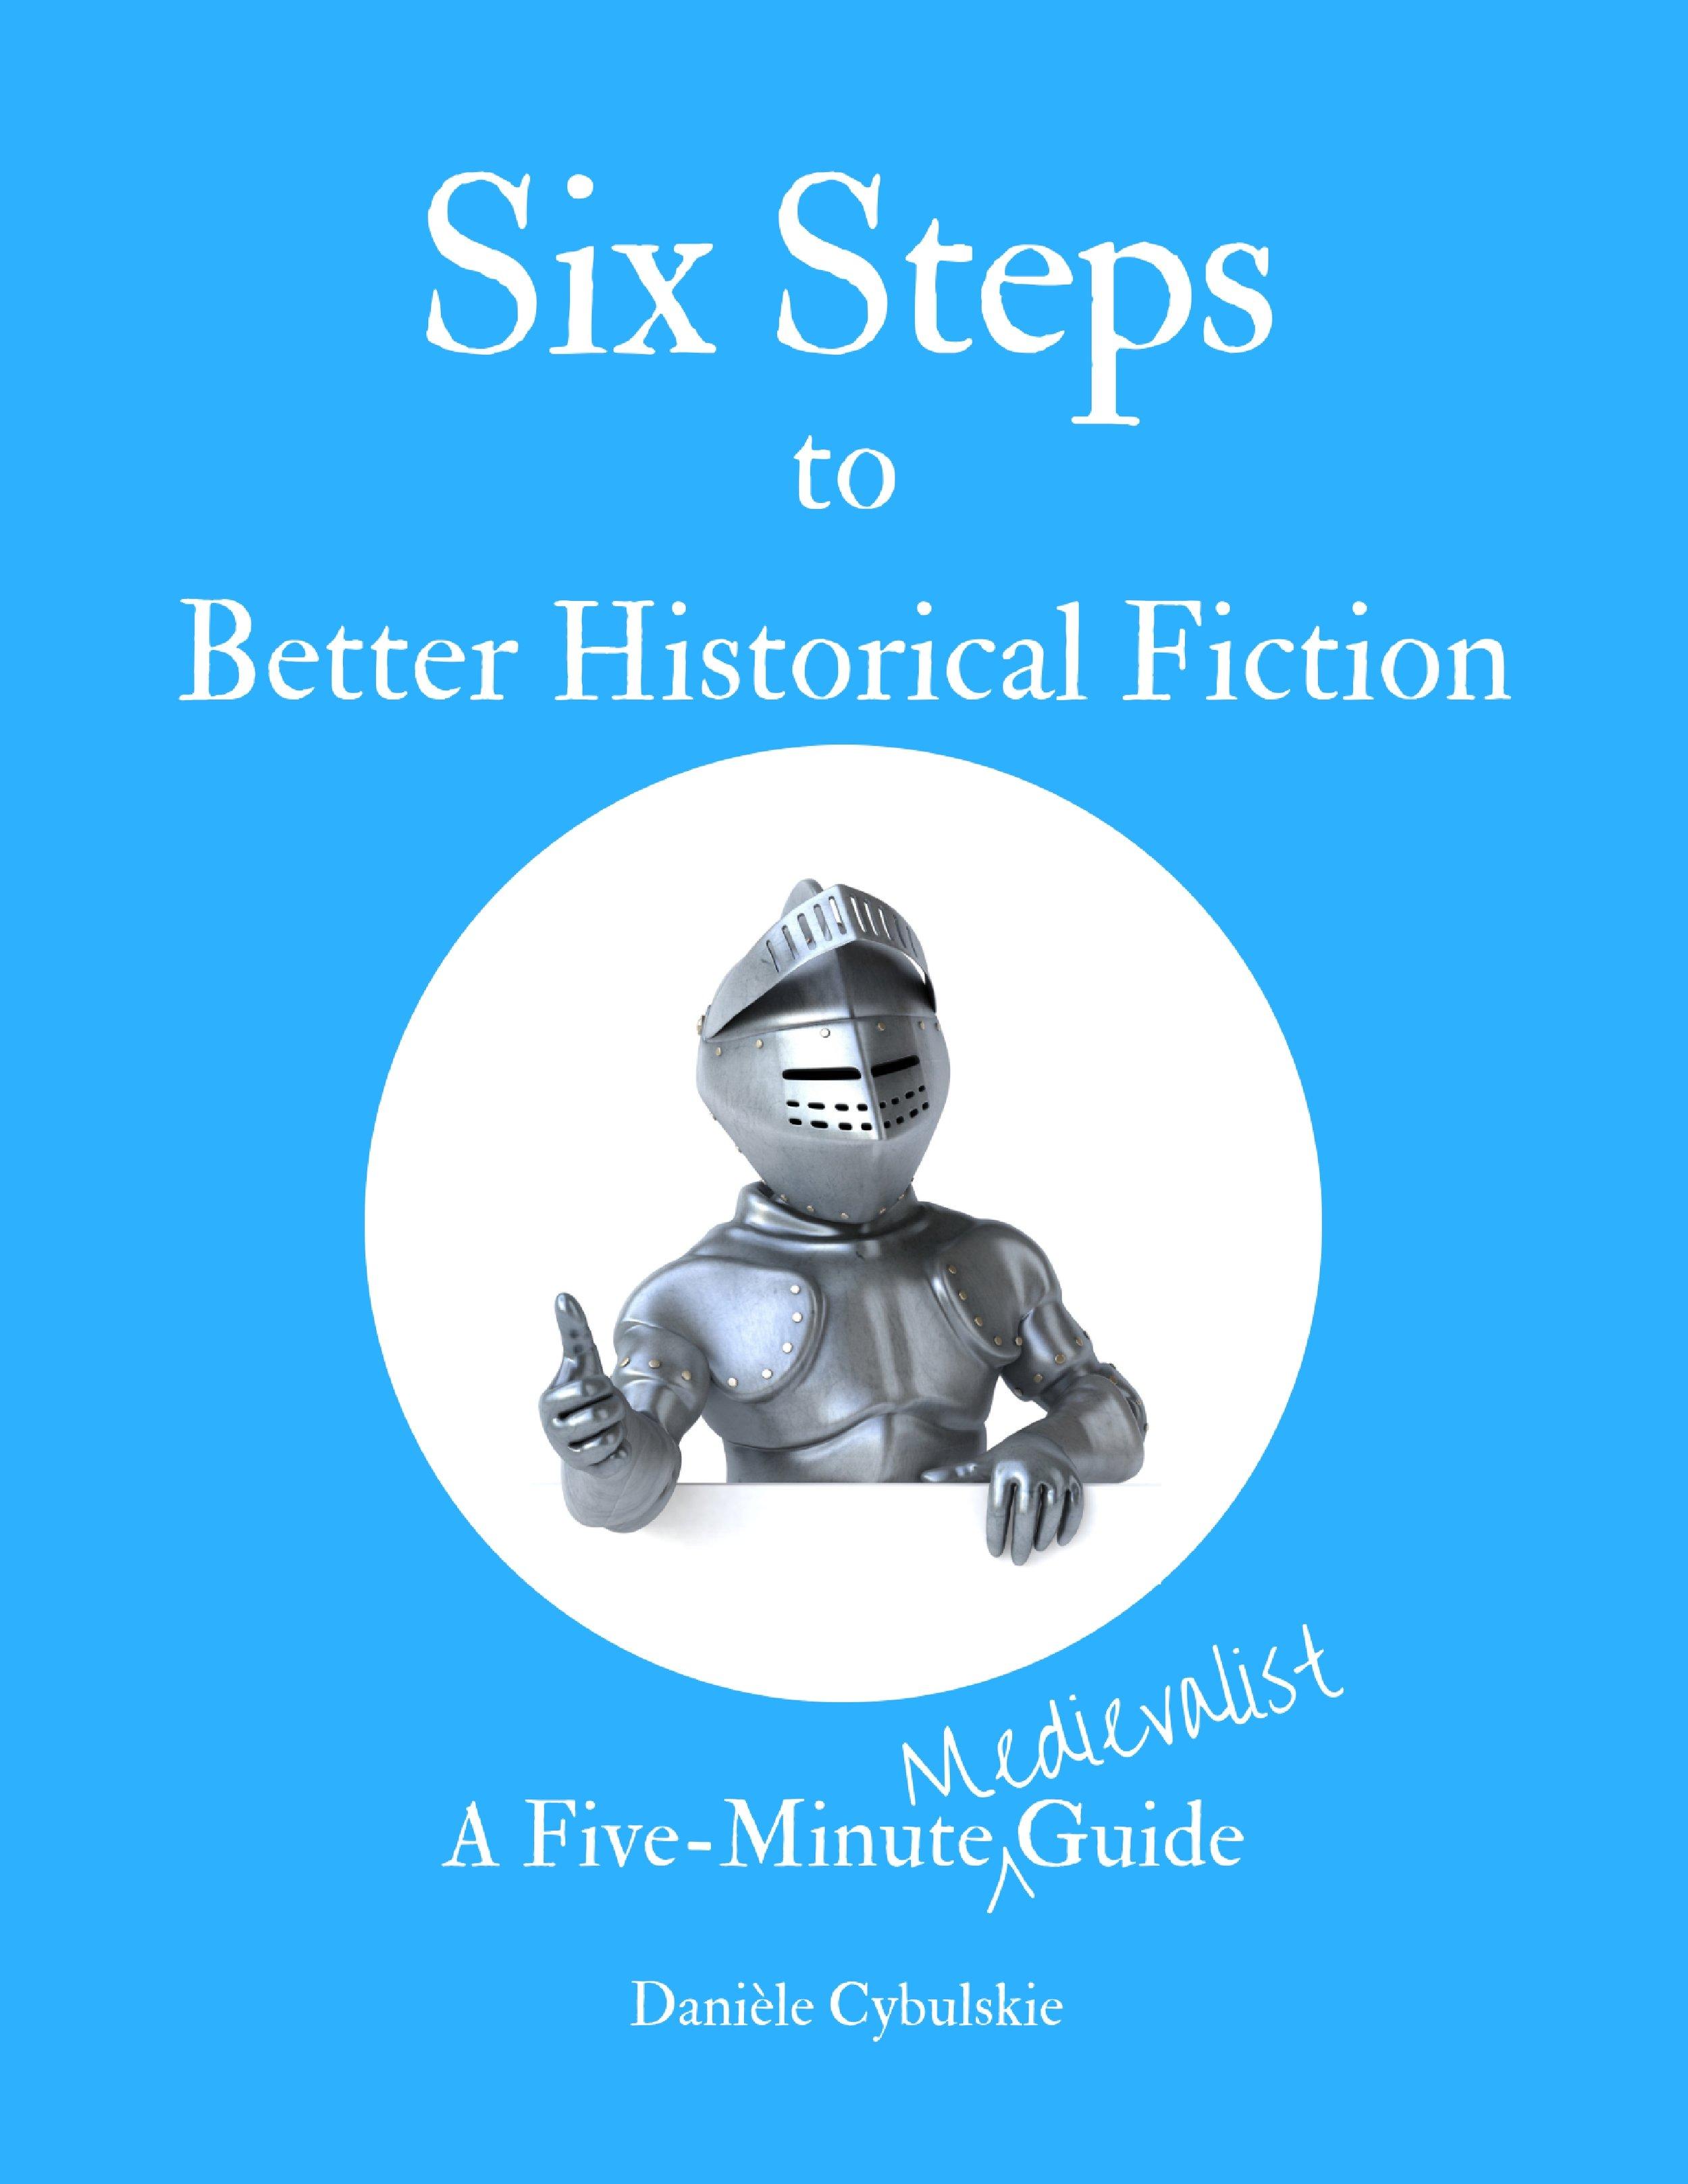 Six Steps (1).jpg